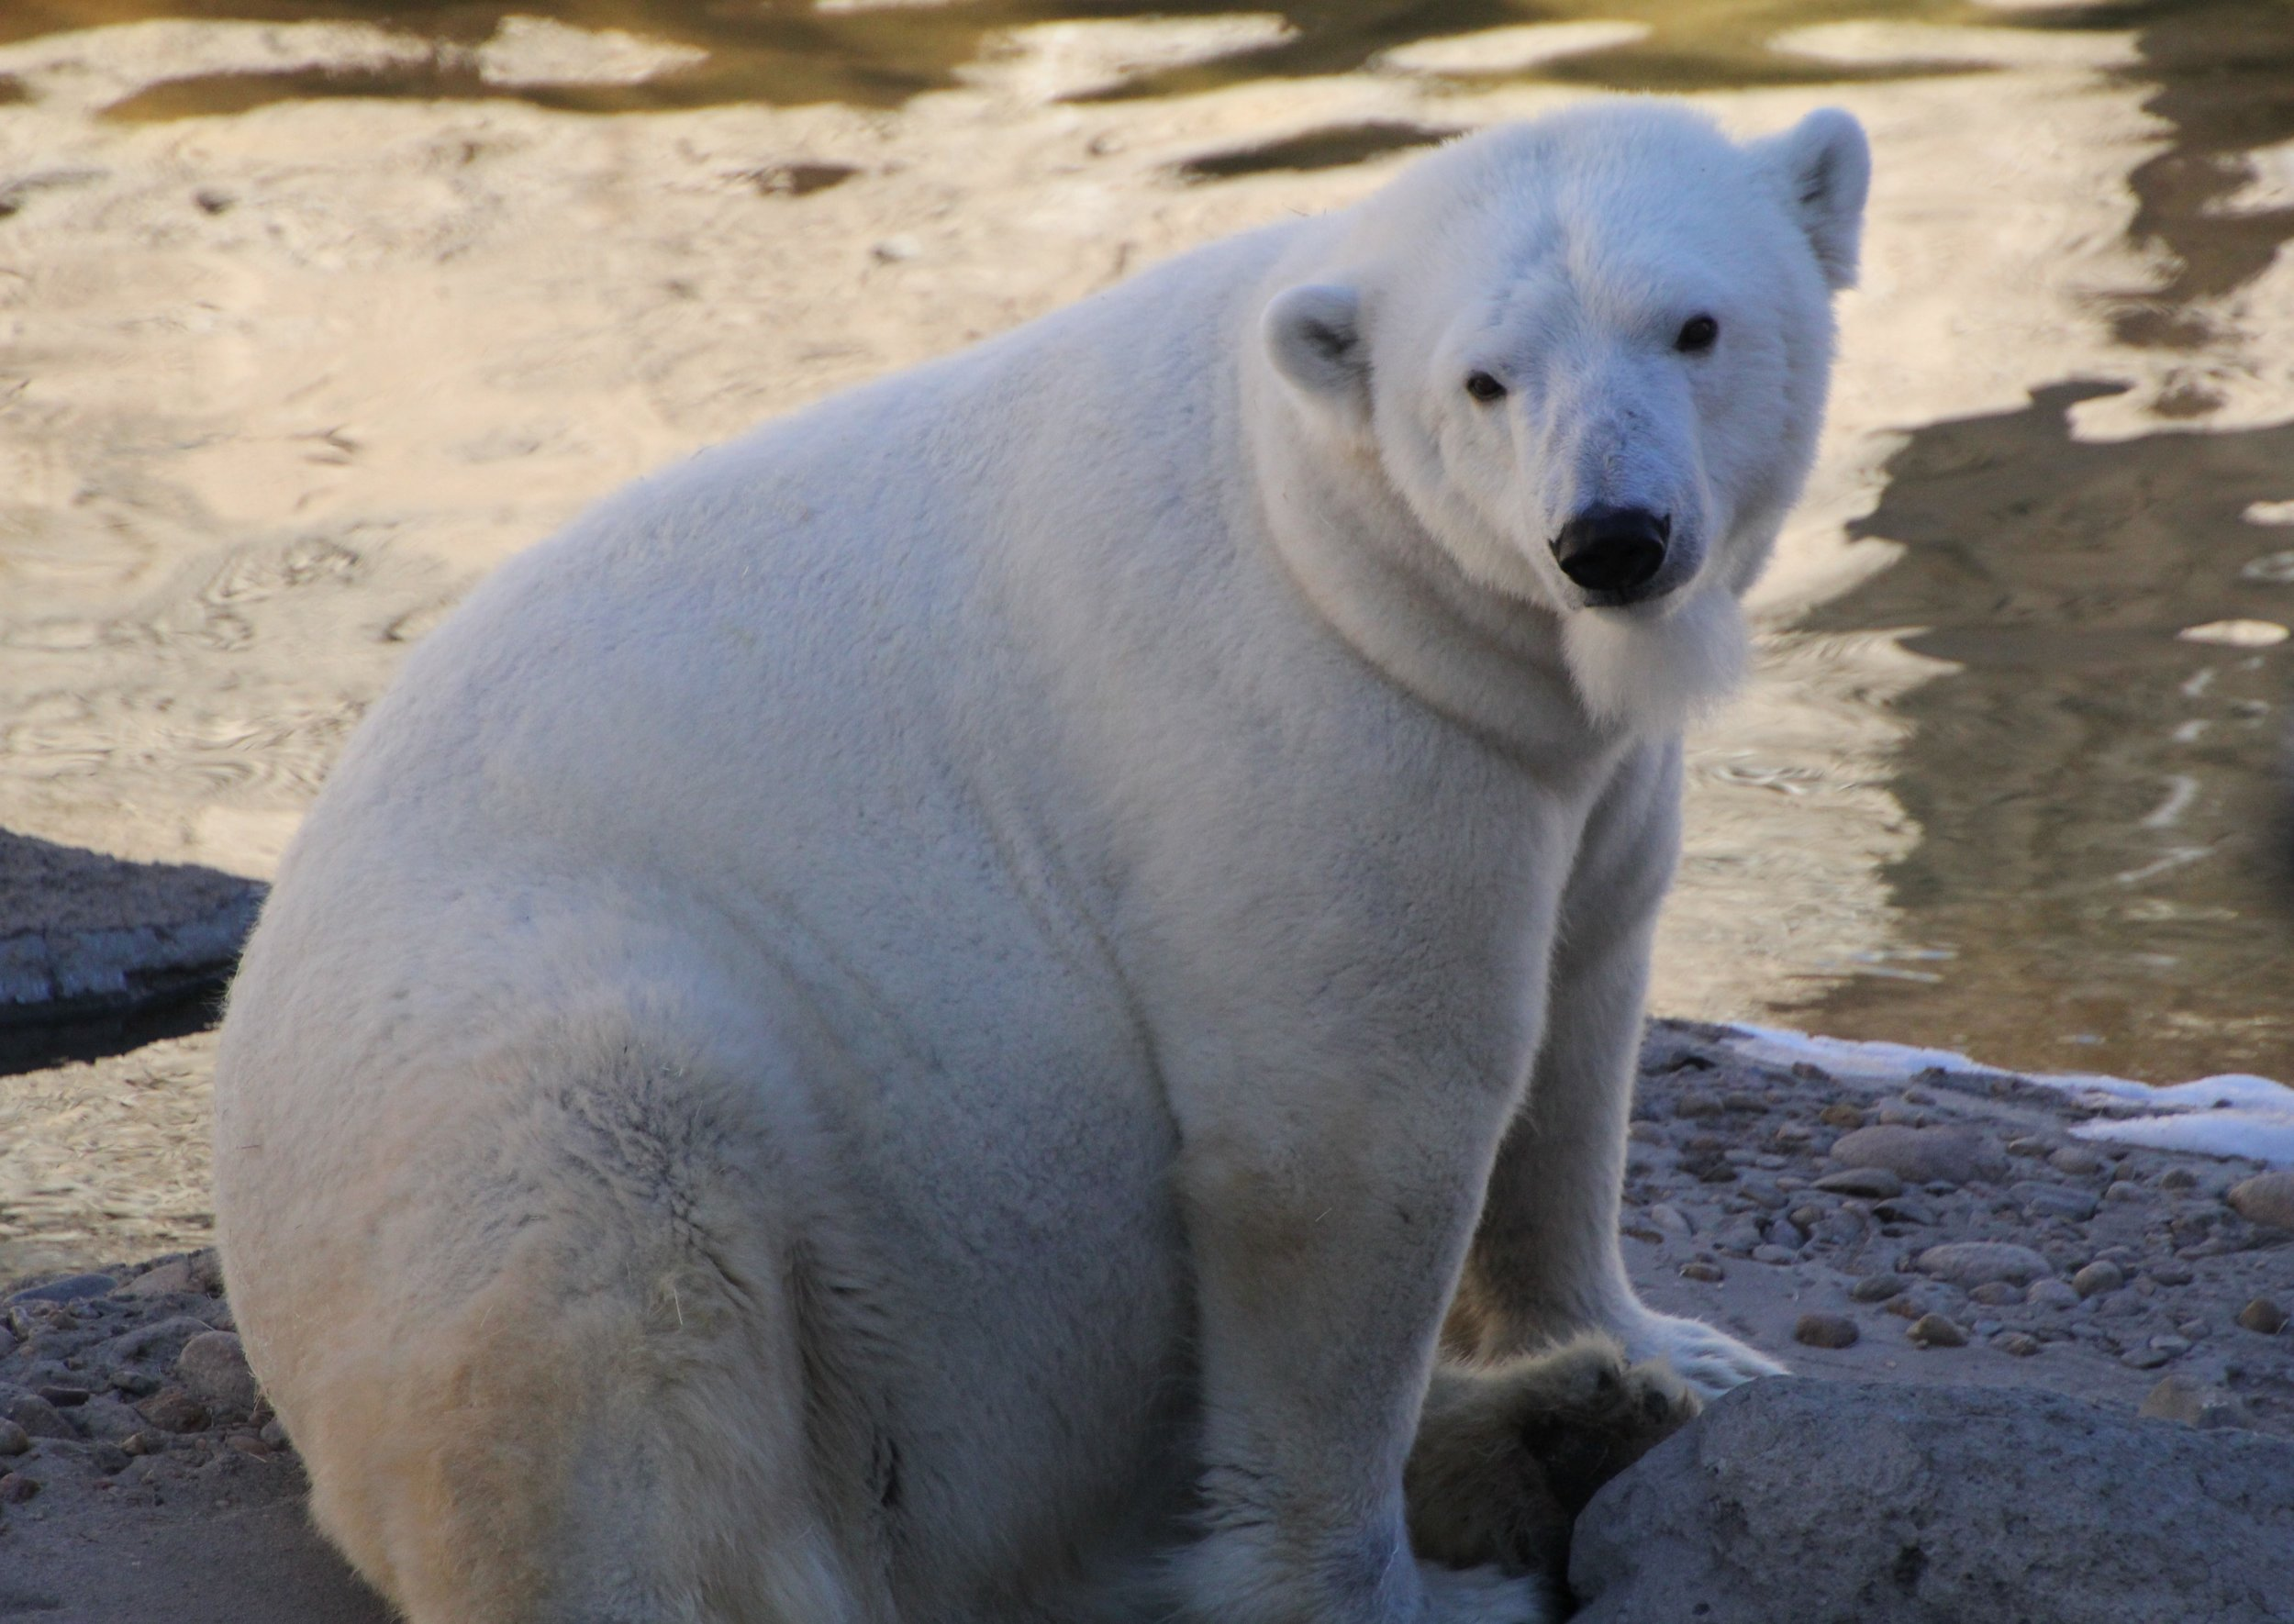 Image courtesy of Denver Zoo.